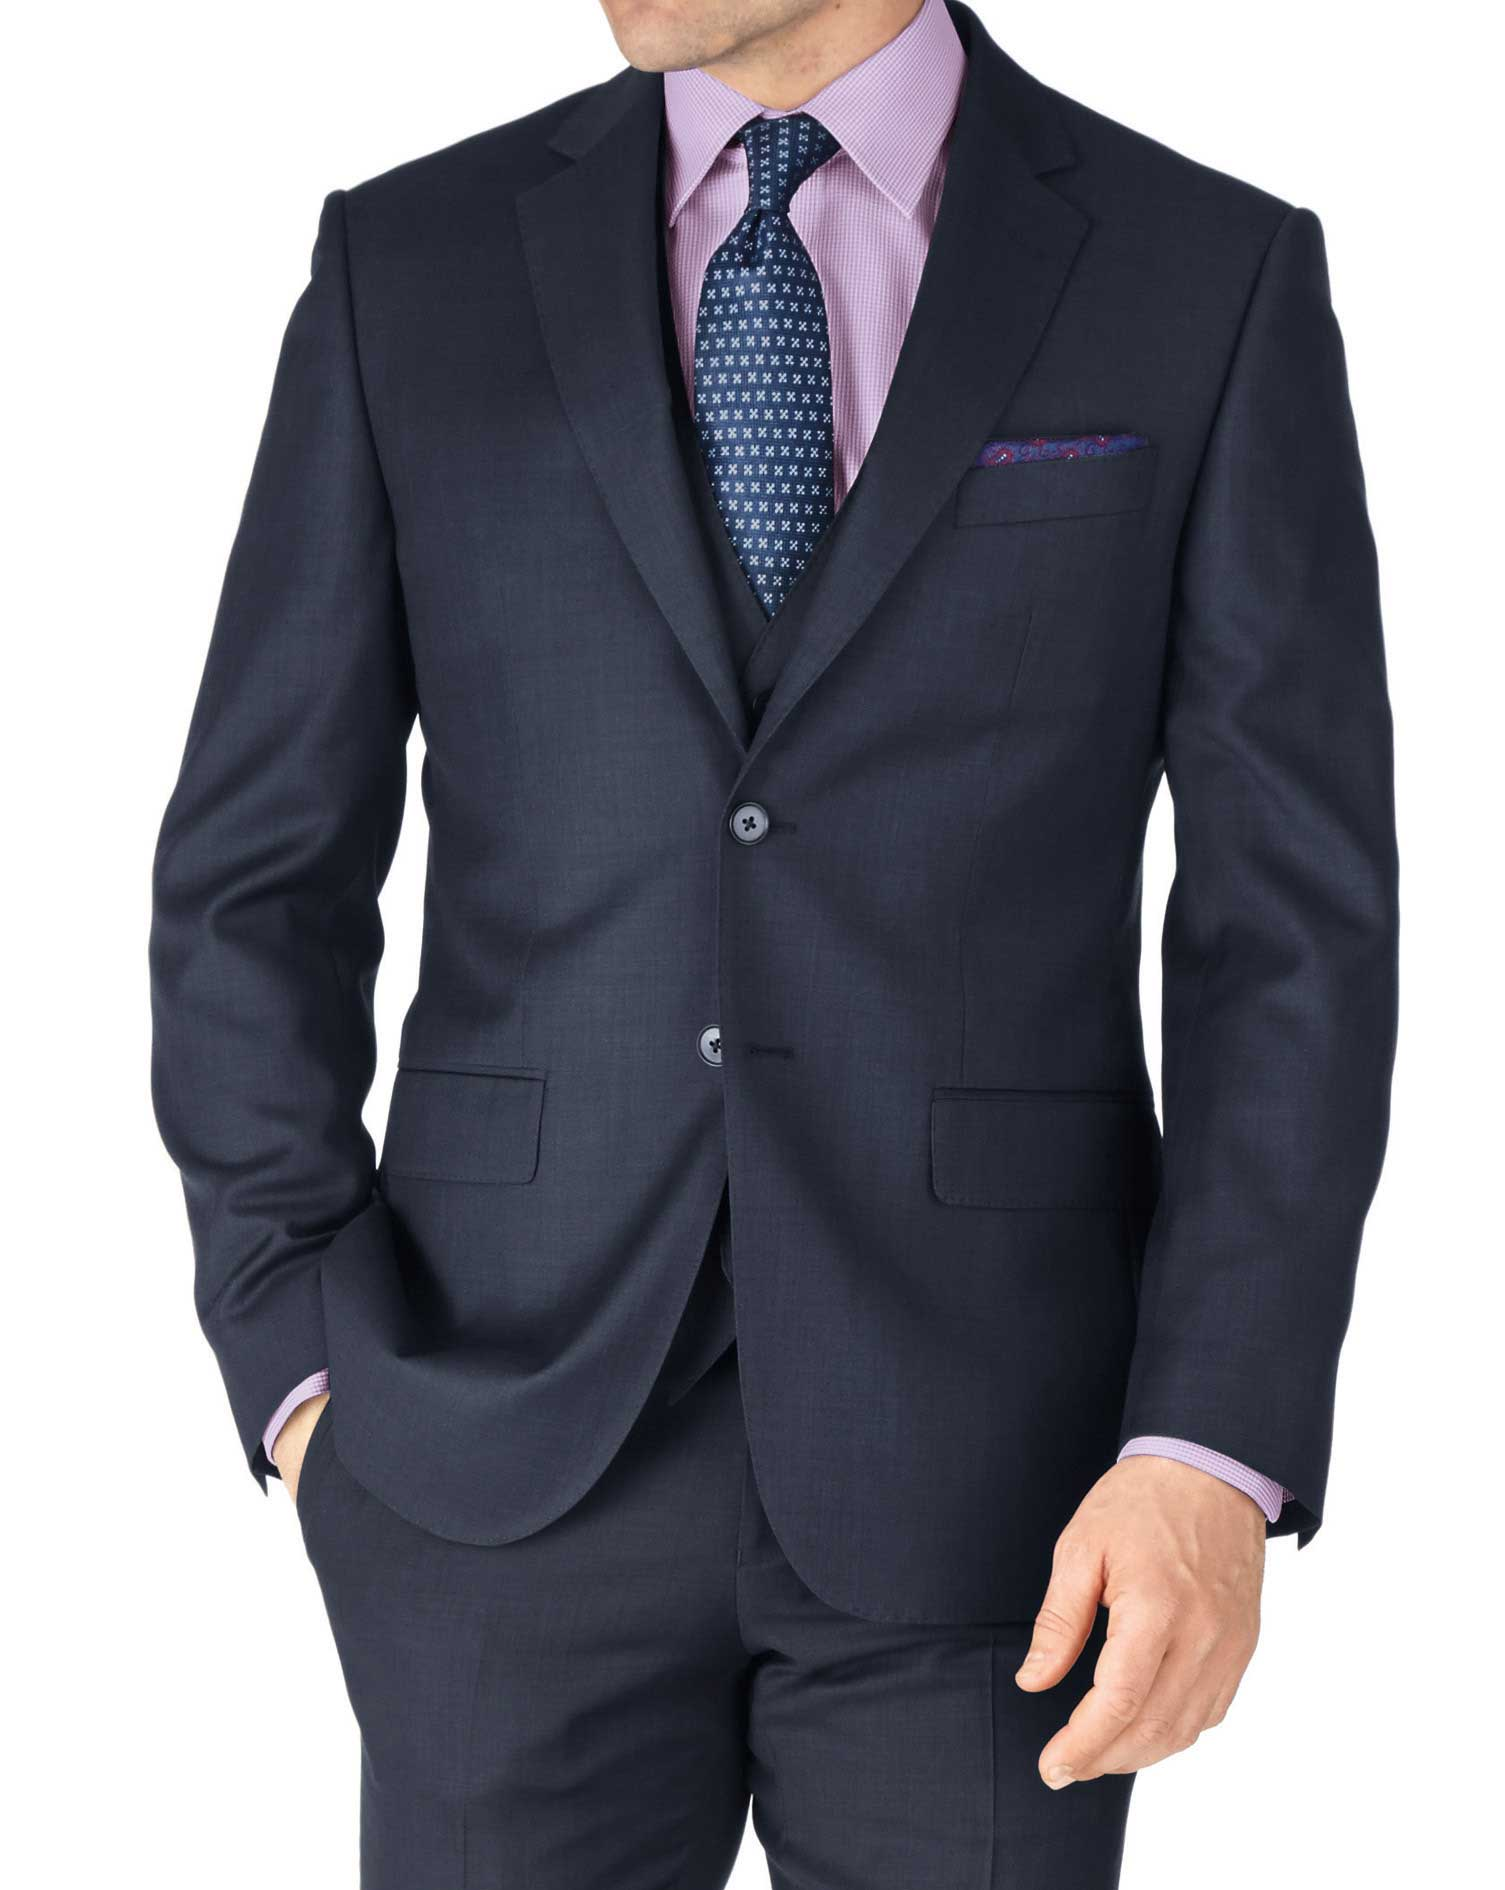 Blue Slim Fit Sharkskin Travel Suit Wool Jacket Size 40 Regular by Charles Tyrwhitt